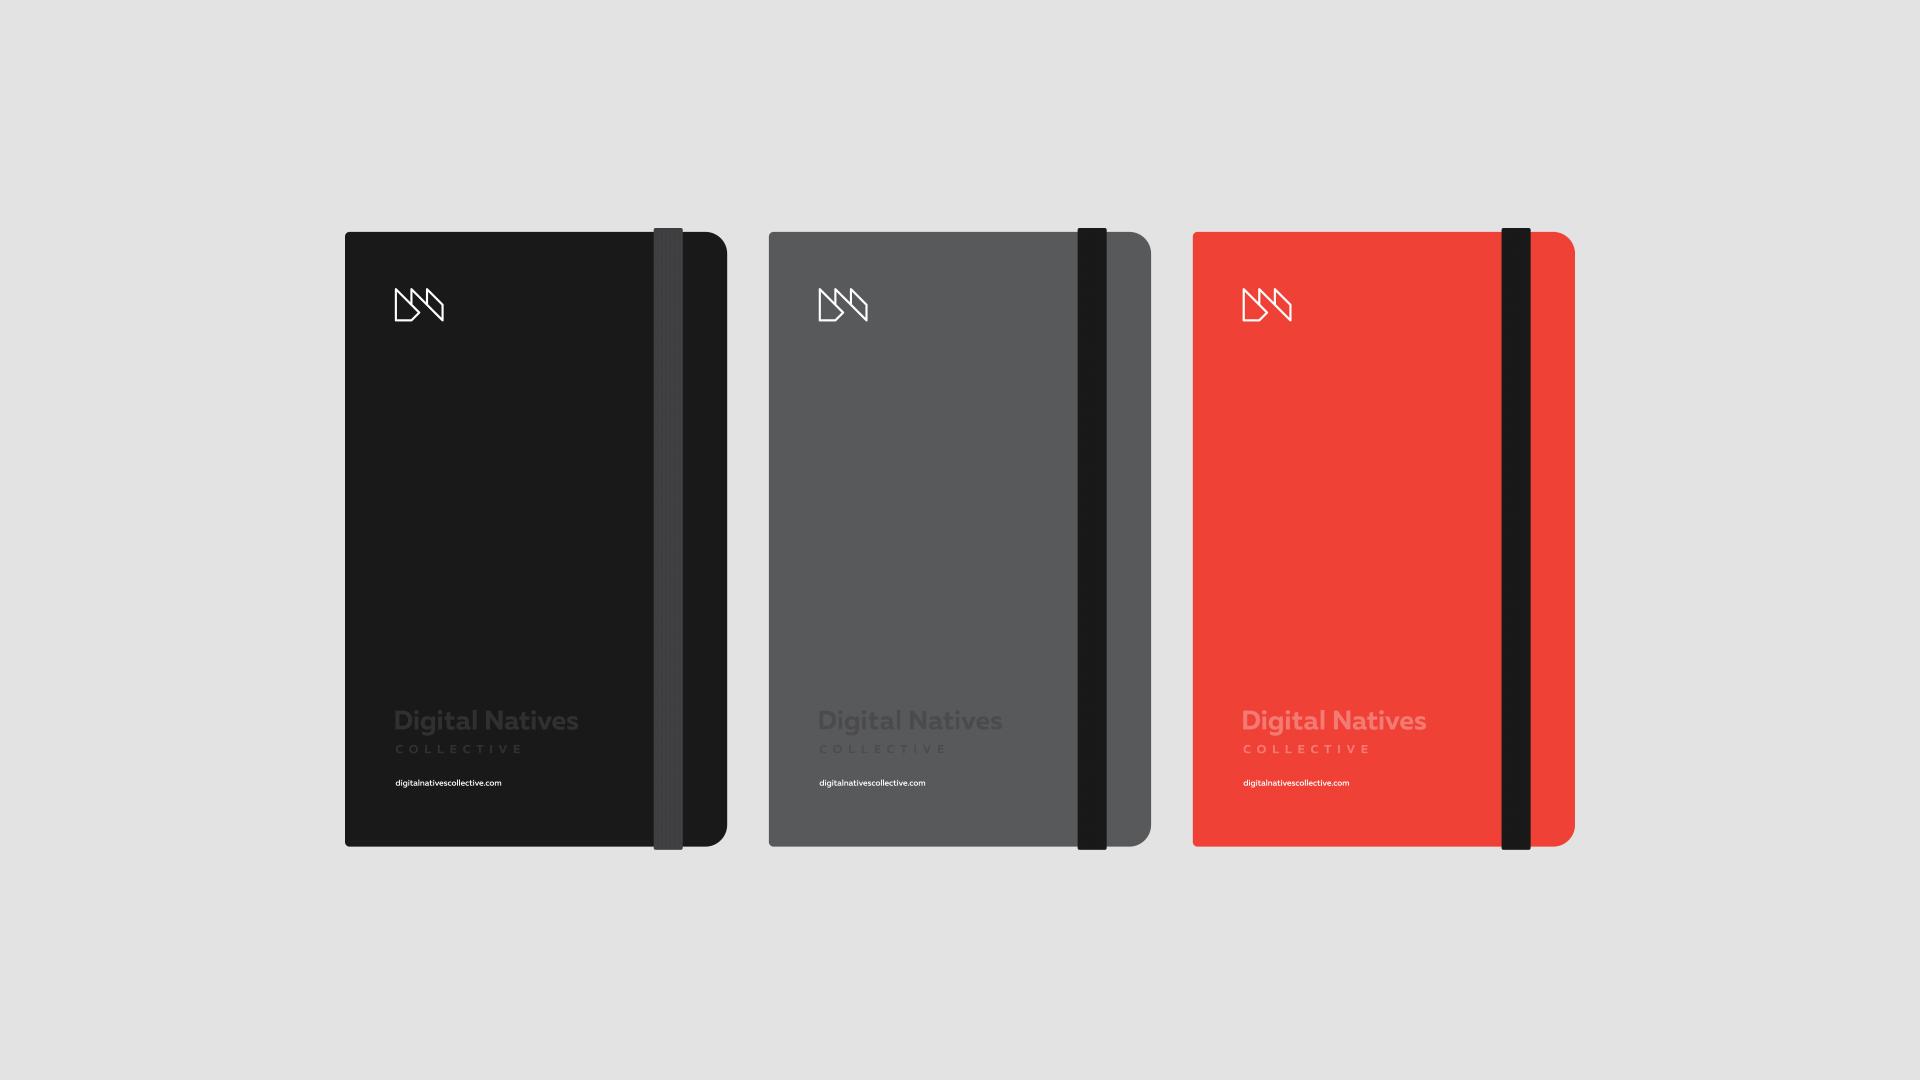 fmx_dnc_notebooks